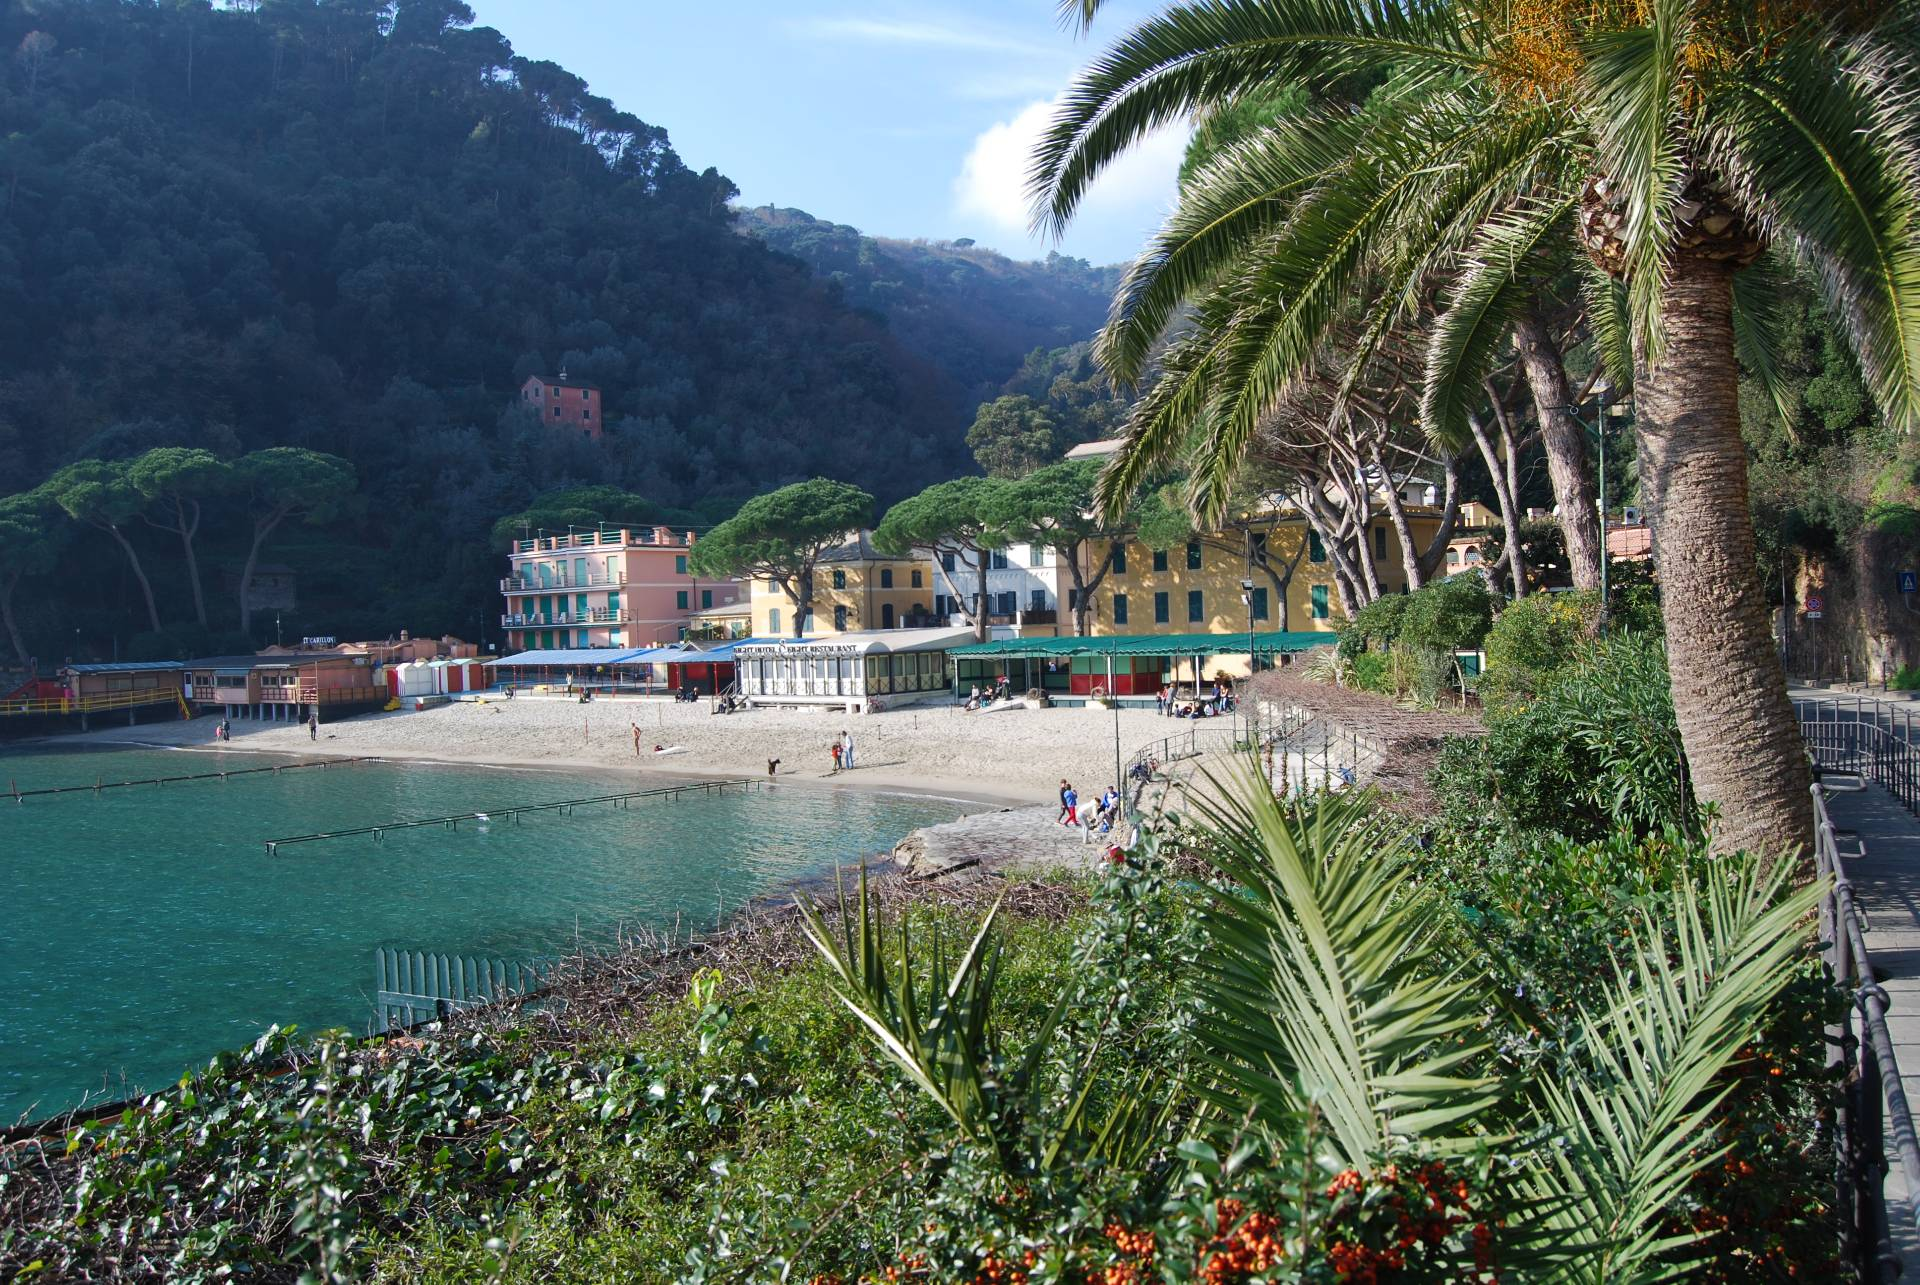 Bilocale Santa Margherita Ligure Via Paraggi A Monte 1